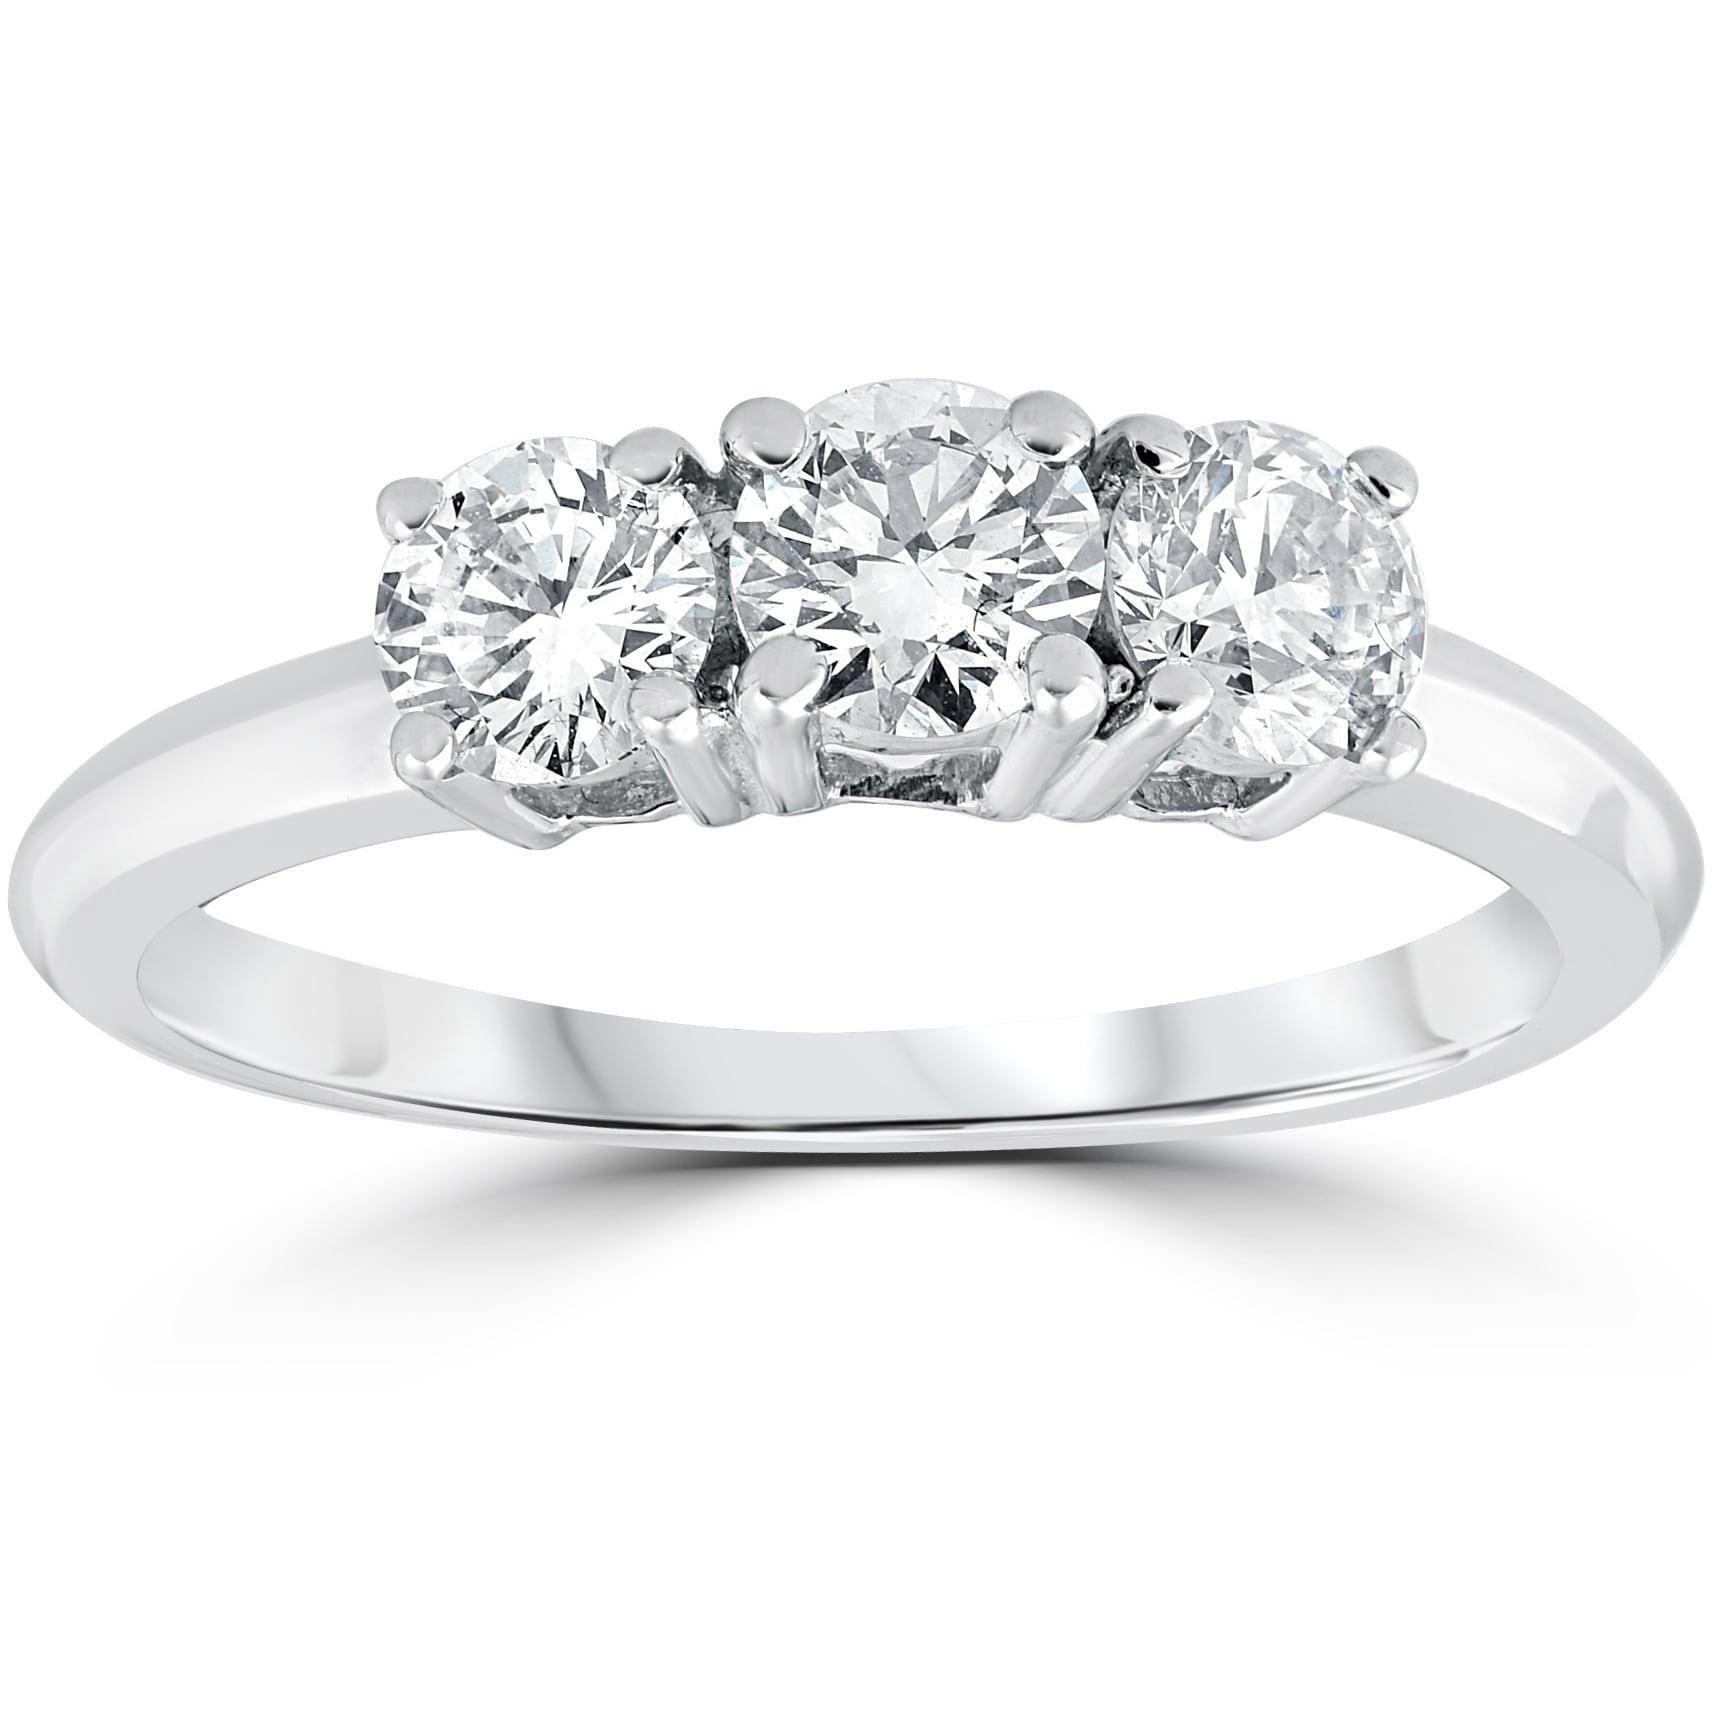 14K White Gold Plated Round Cut White CZ Diamond Engagement Wedding Three Stone Ring